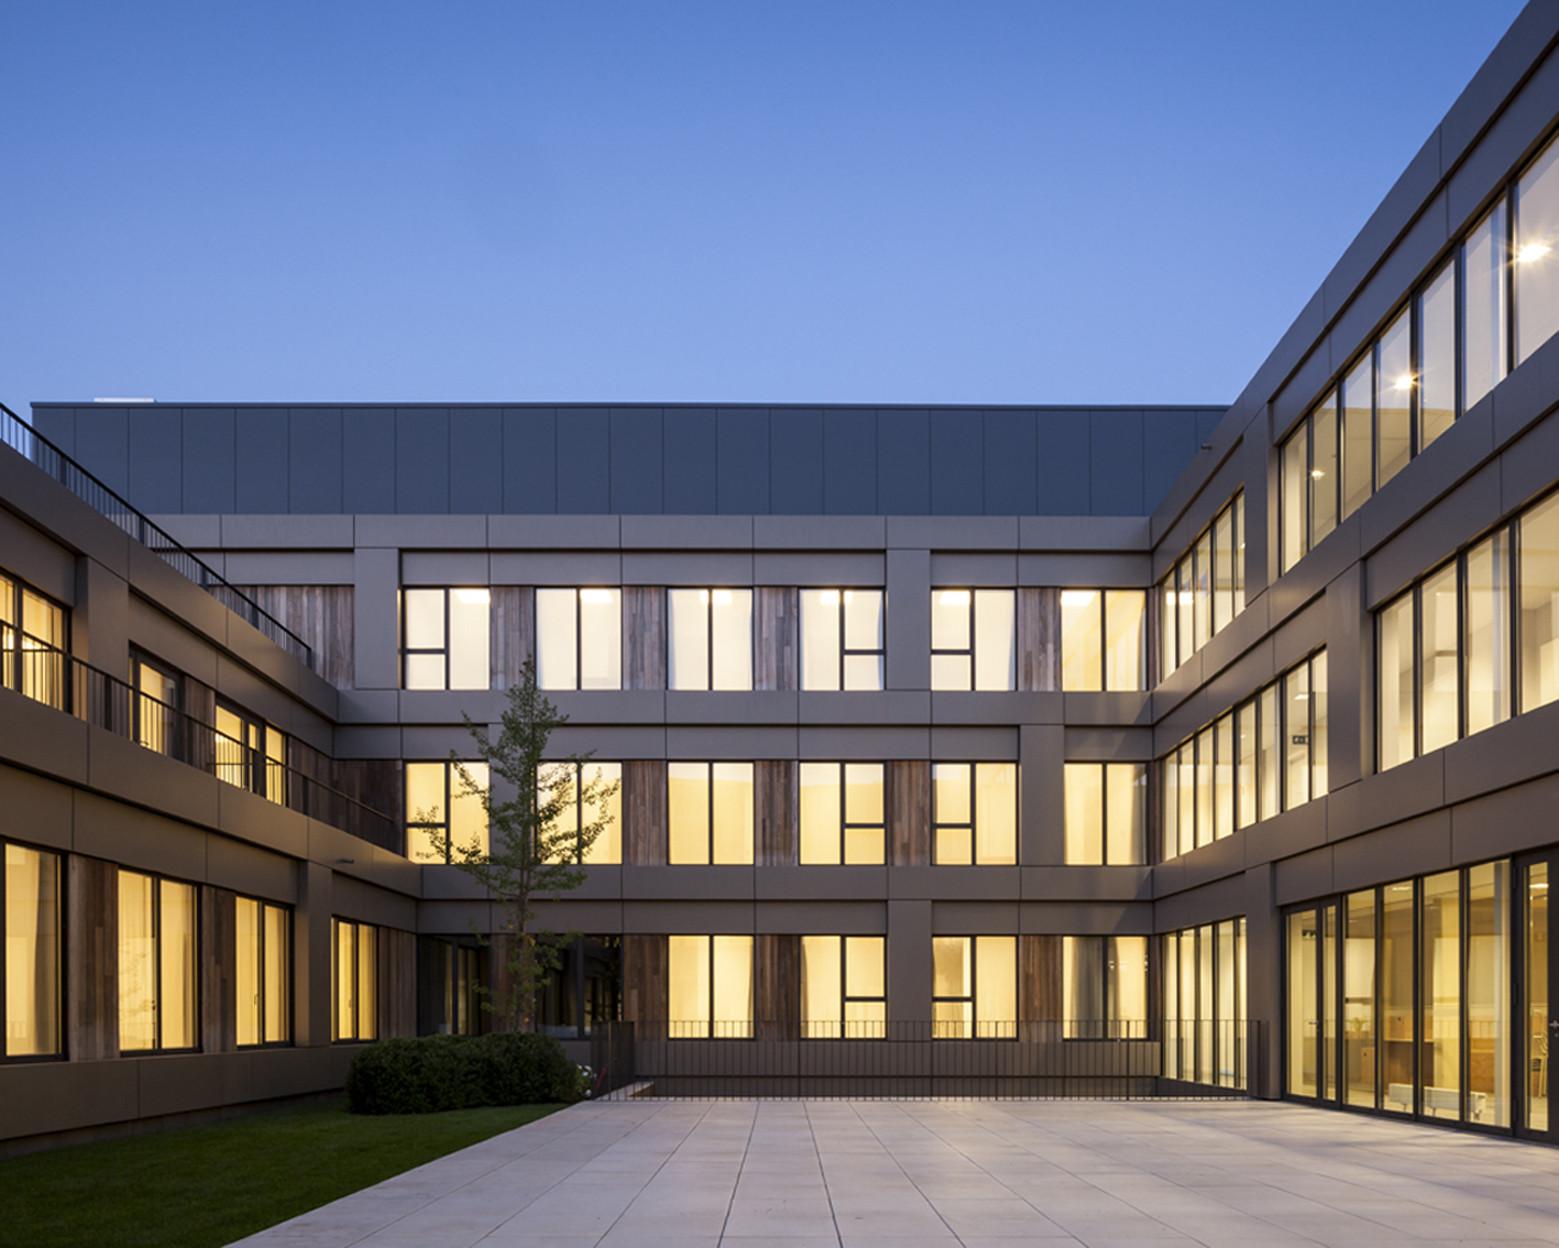 Gallery of Elderly Care Campus / Areal Architecten - 6